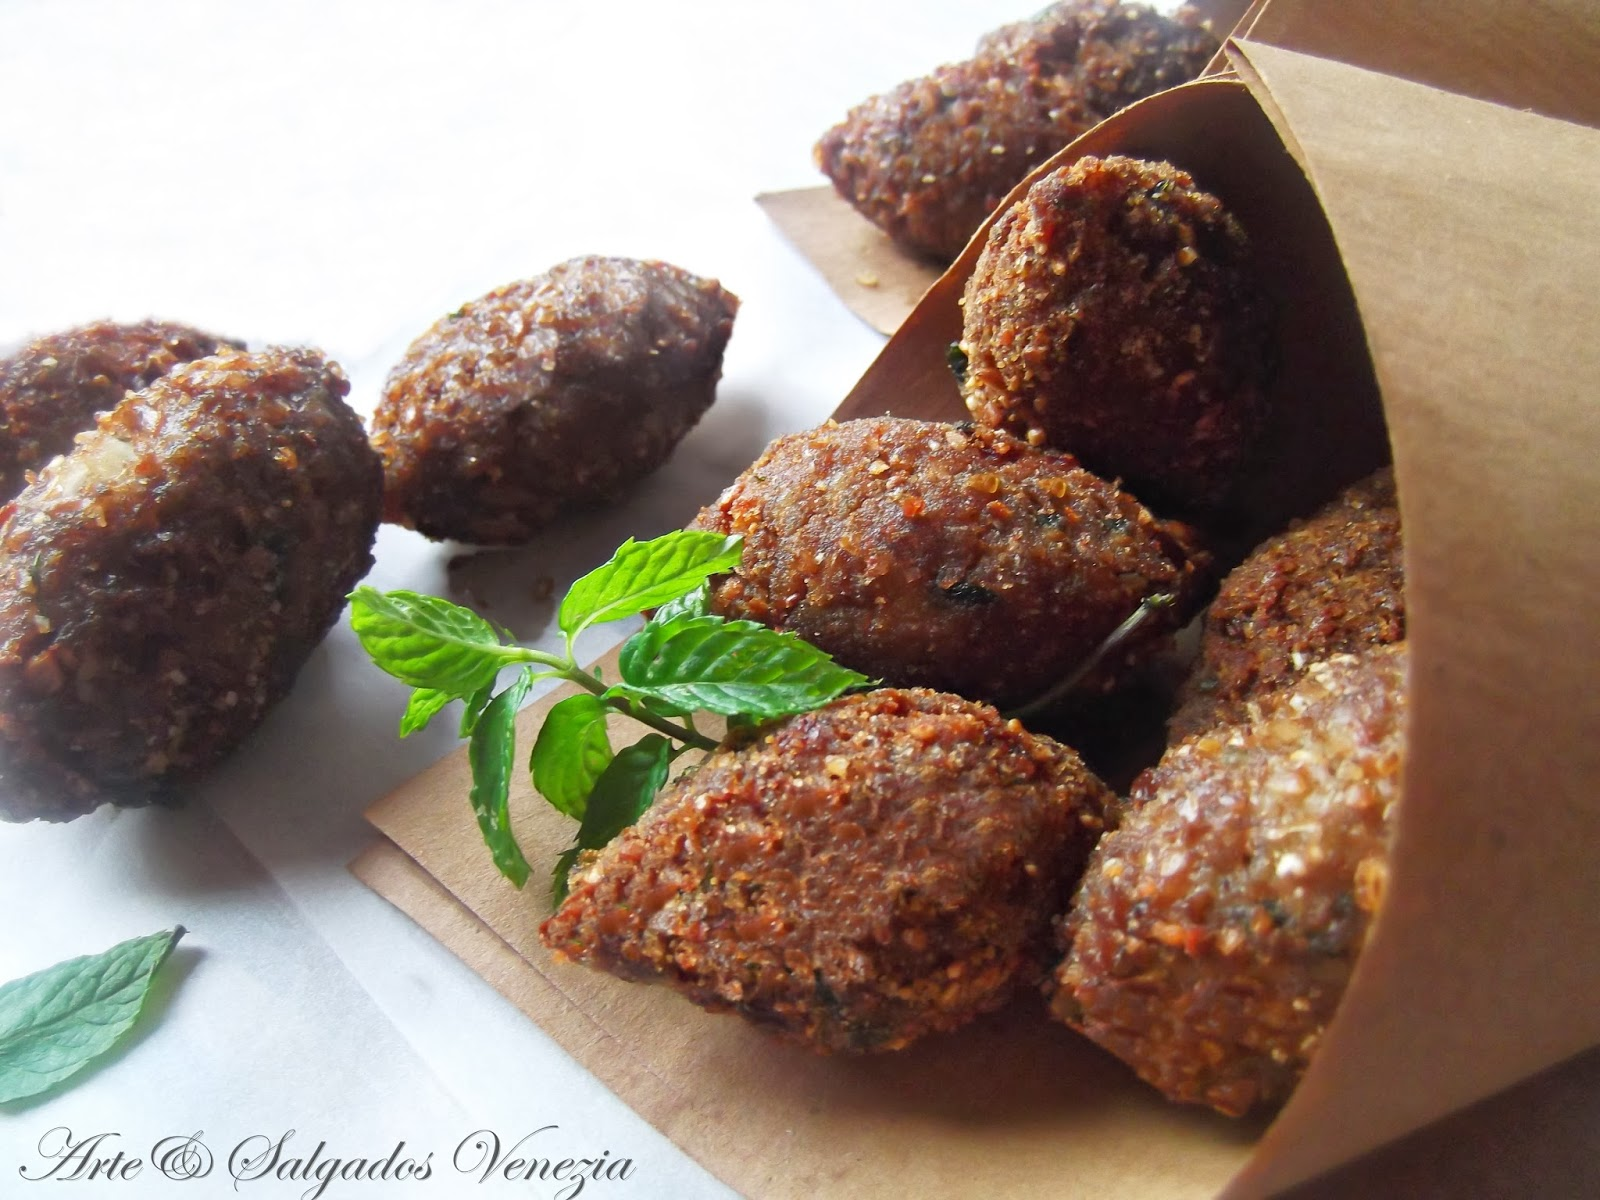 Ricette cucina libanese polpette ricette casalinghe popolari for Cucina libanese